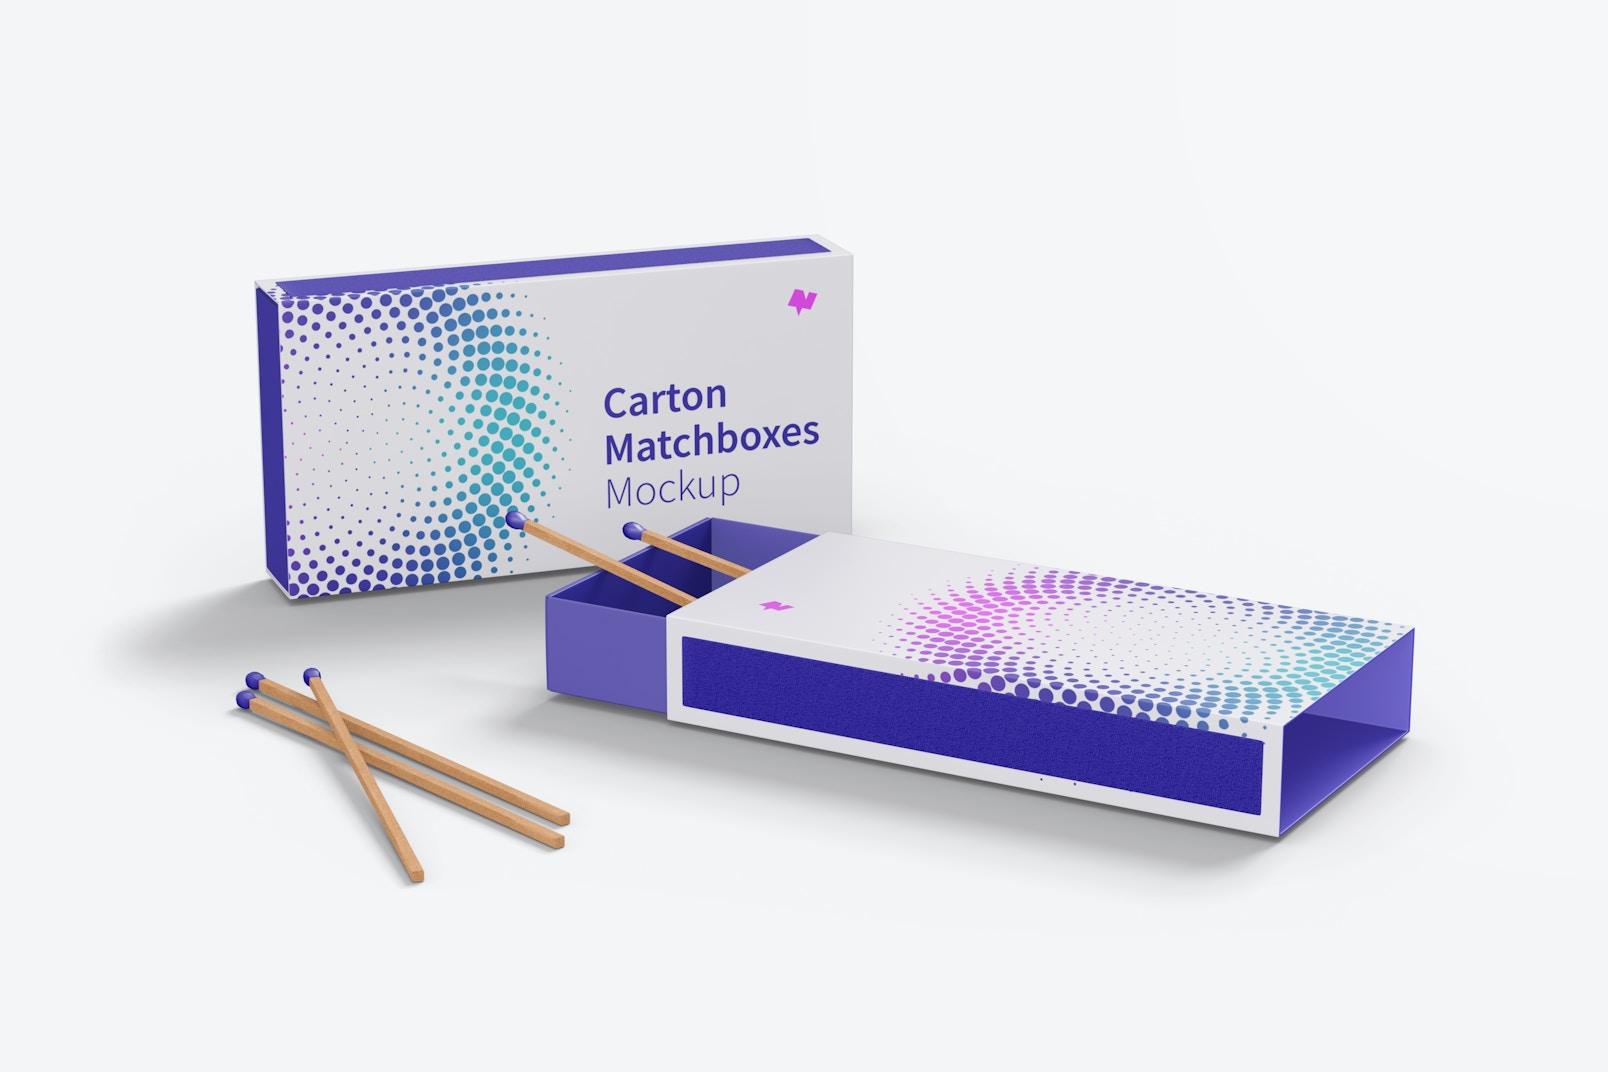 Carton Matchboxes Mockup, Side View